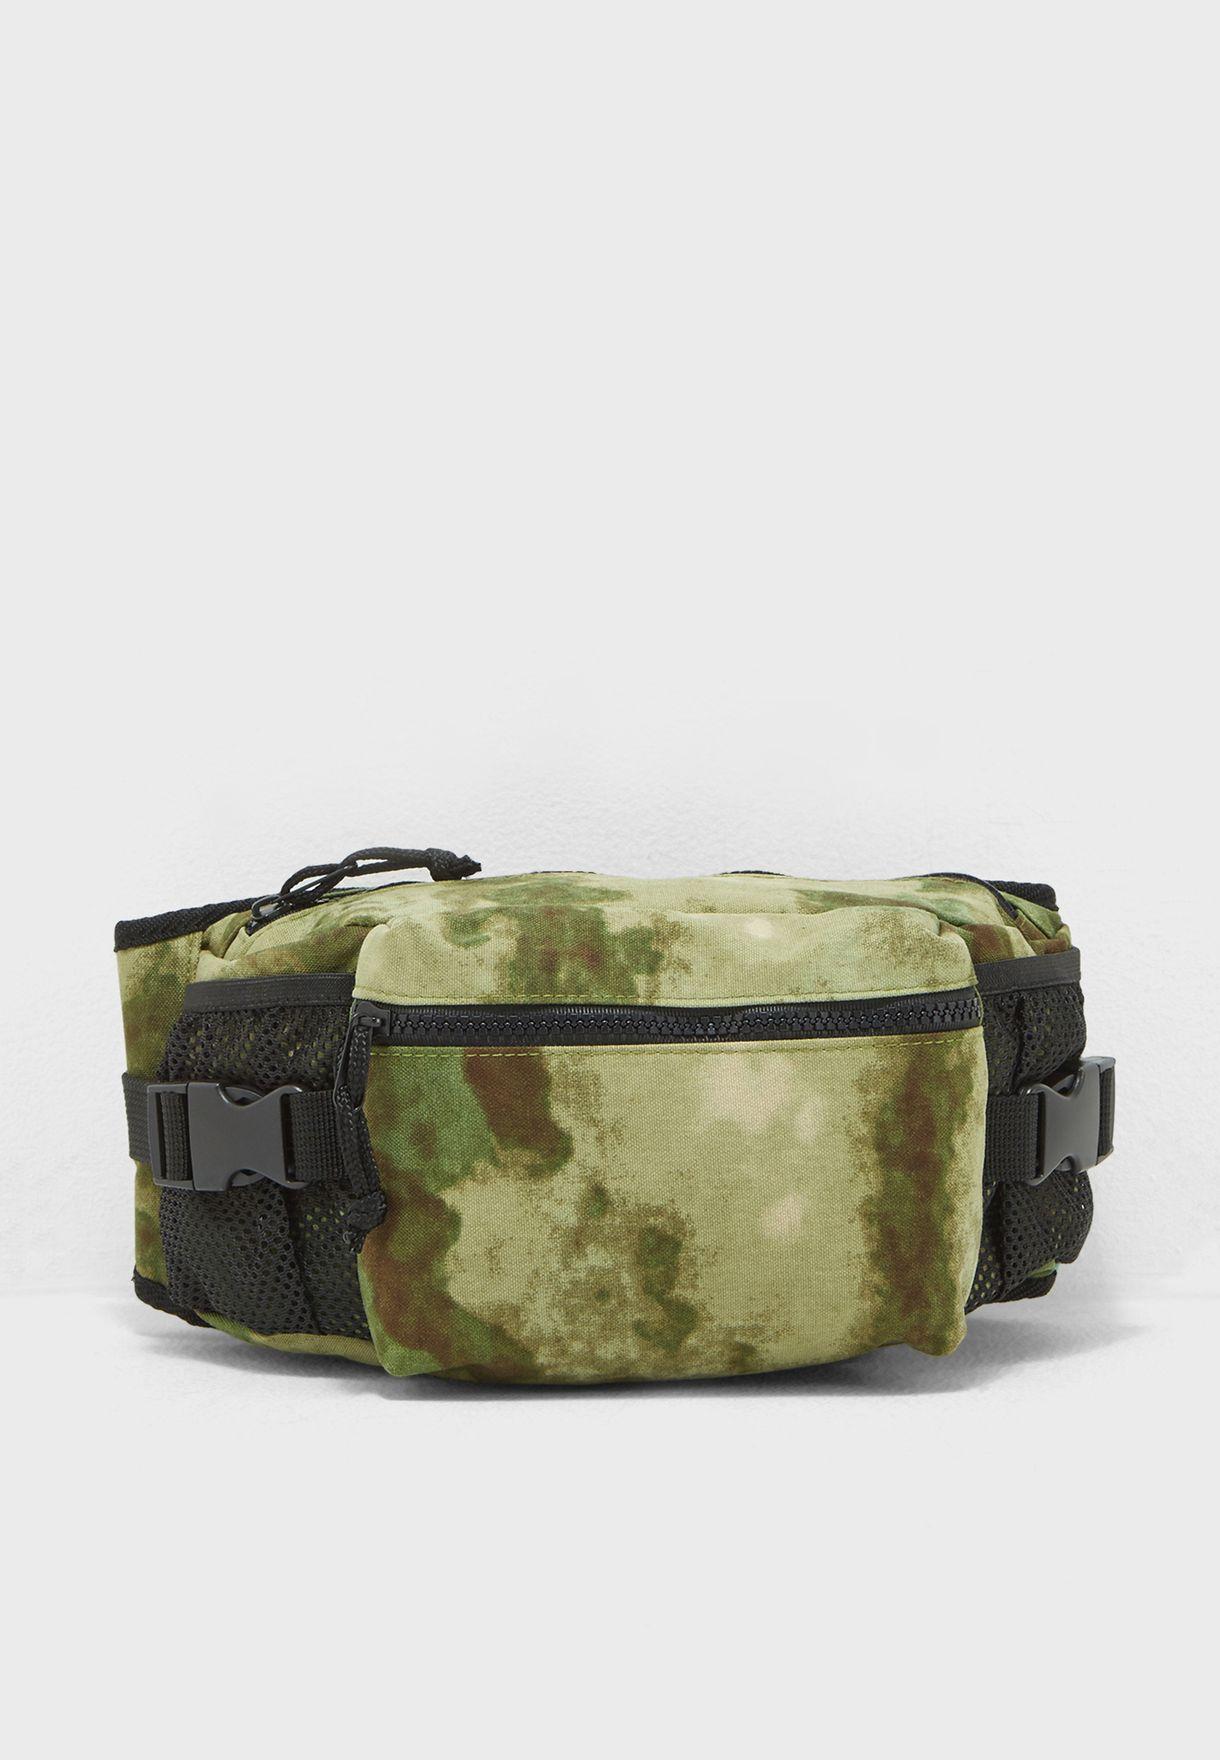 58f1ac7250c0 Shop Topman prints Camo Print Waist Bag 56T24PGRN for Men in ...